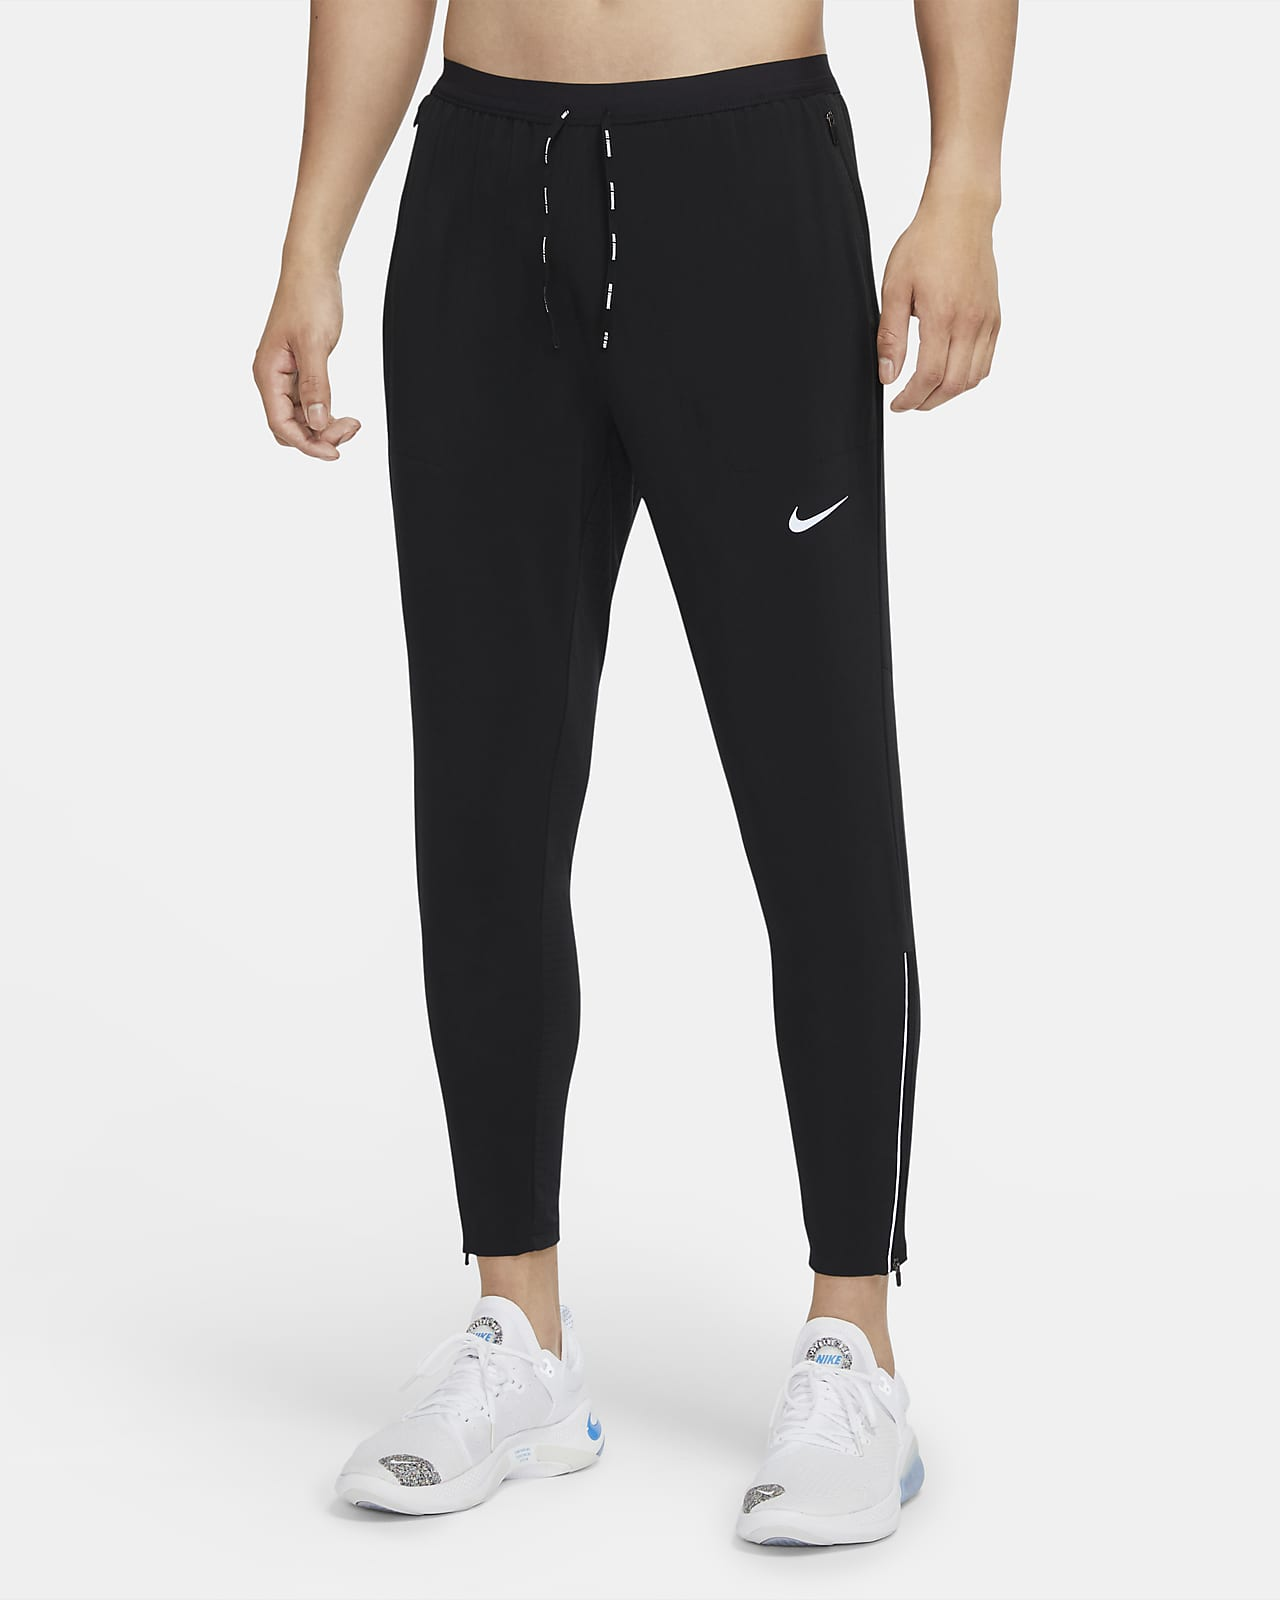 Pantalon de running tissé Nike Phenom Elite pour Homme